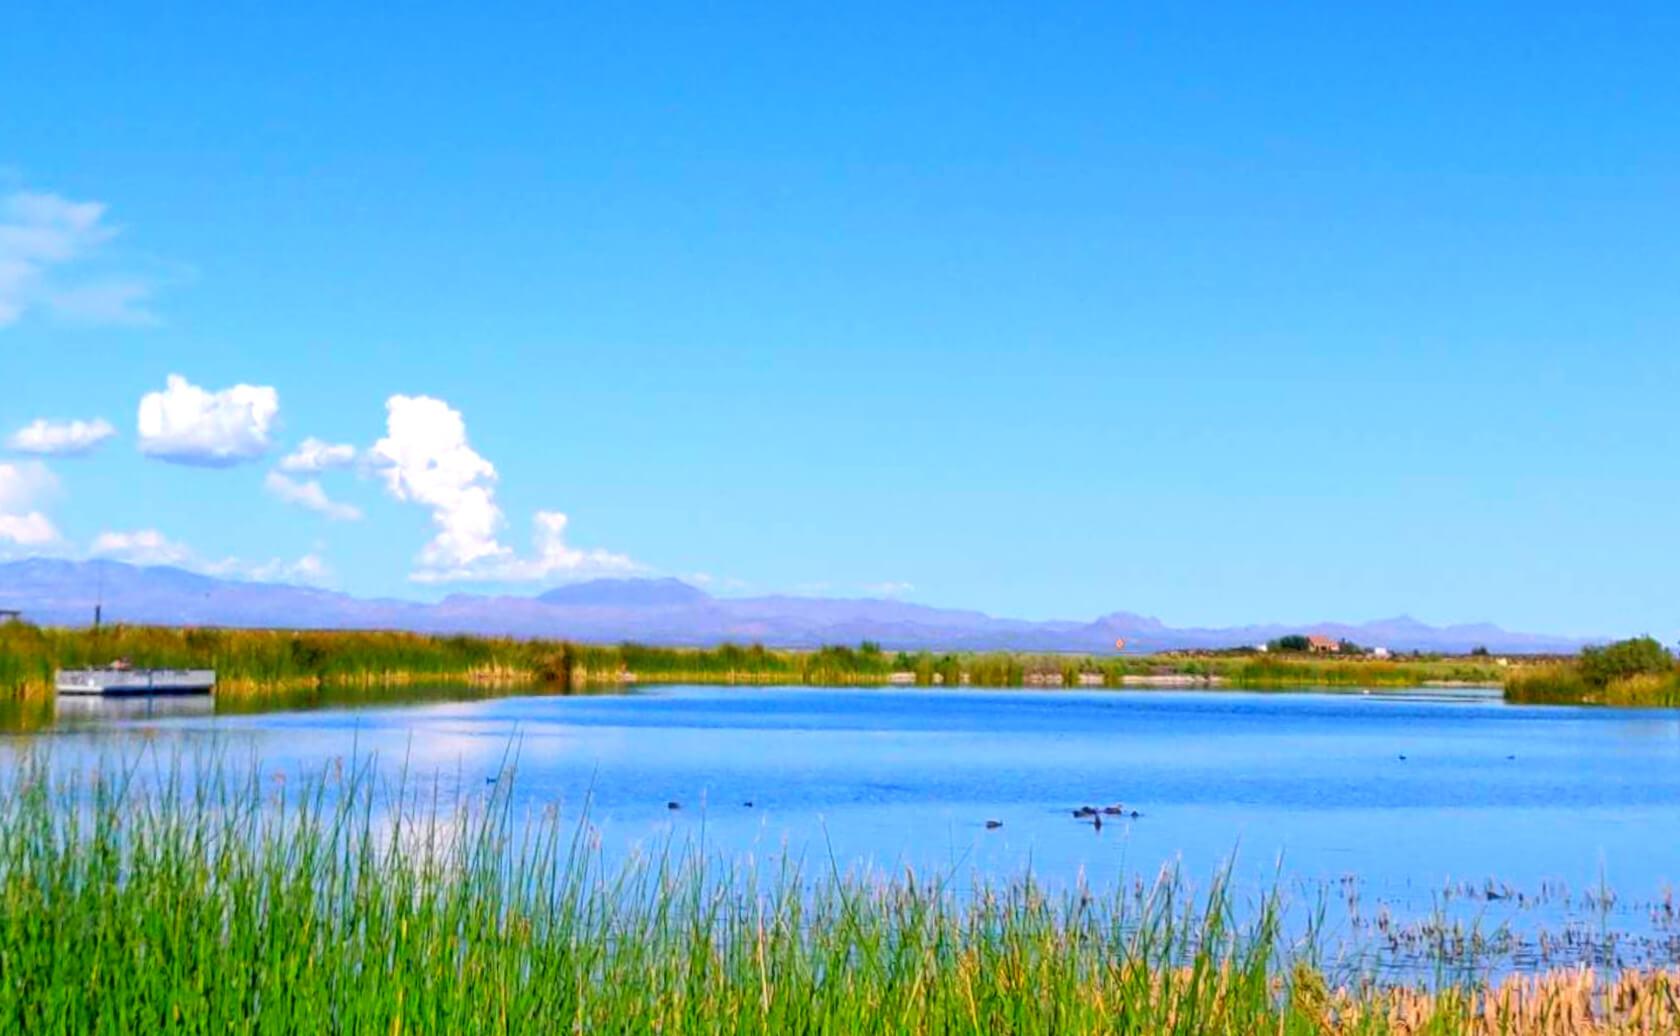 Roper-Lake-Fishing-Guide-Report-Safford-AZ-06